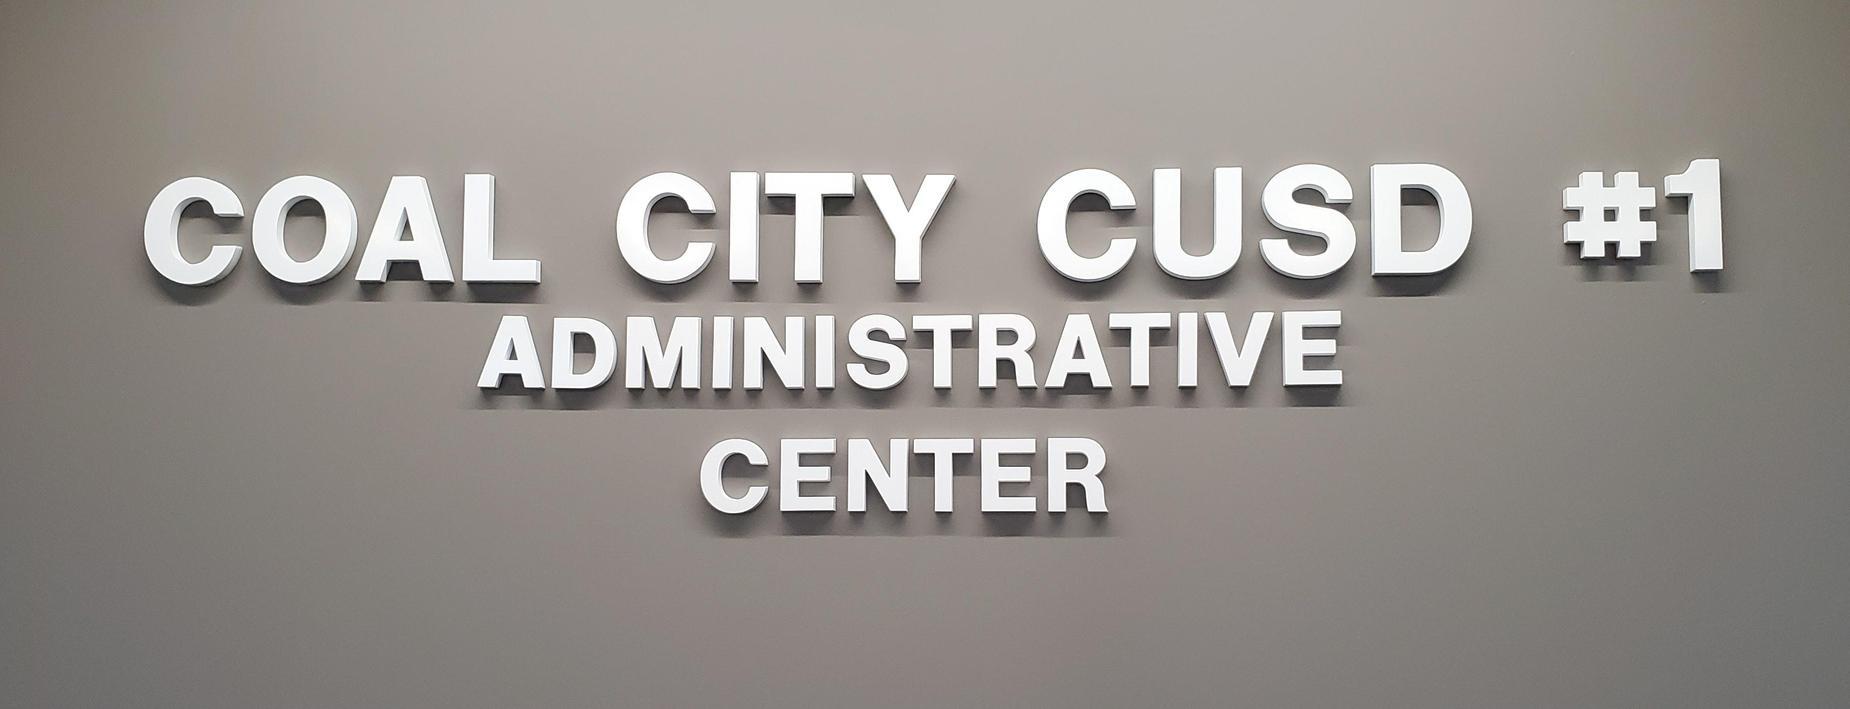 CCCUSD#1 Coal City